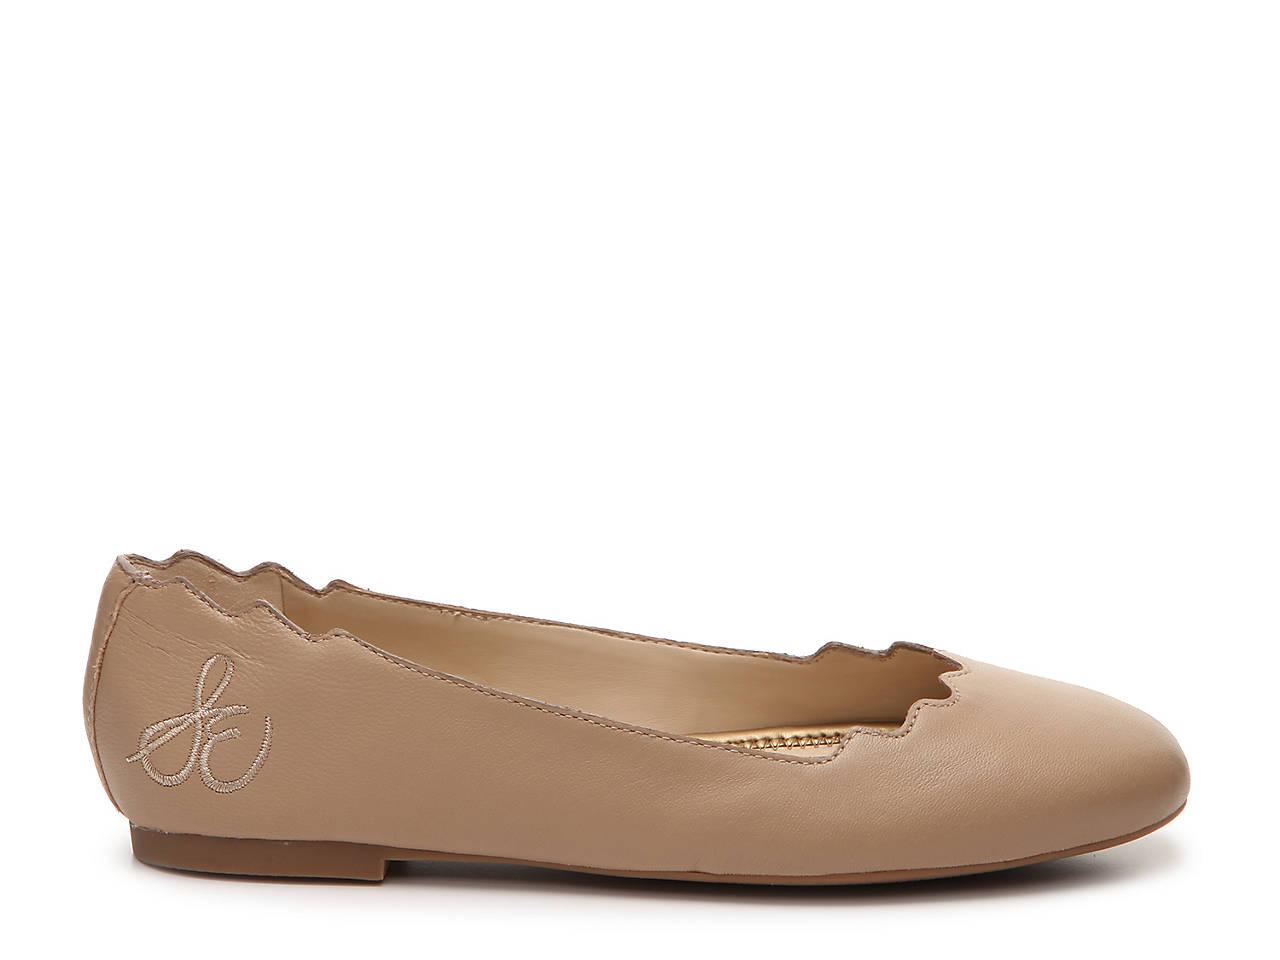 6ea8c9cd0365 Sam Edelman Finnegan Ballet Flat Women s Shoes